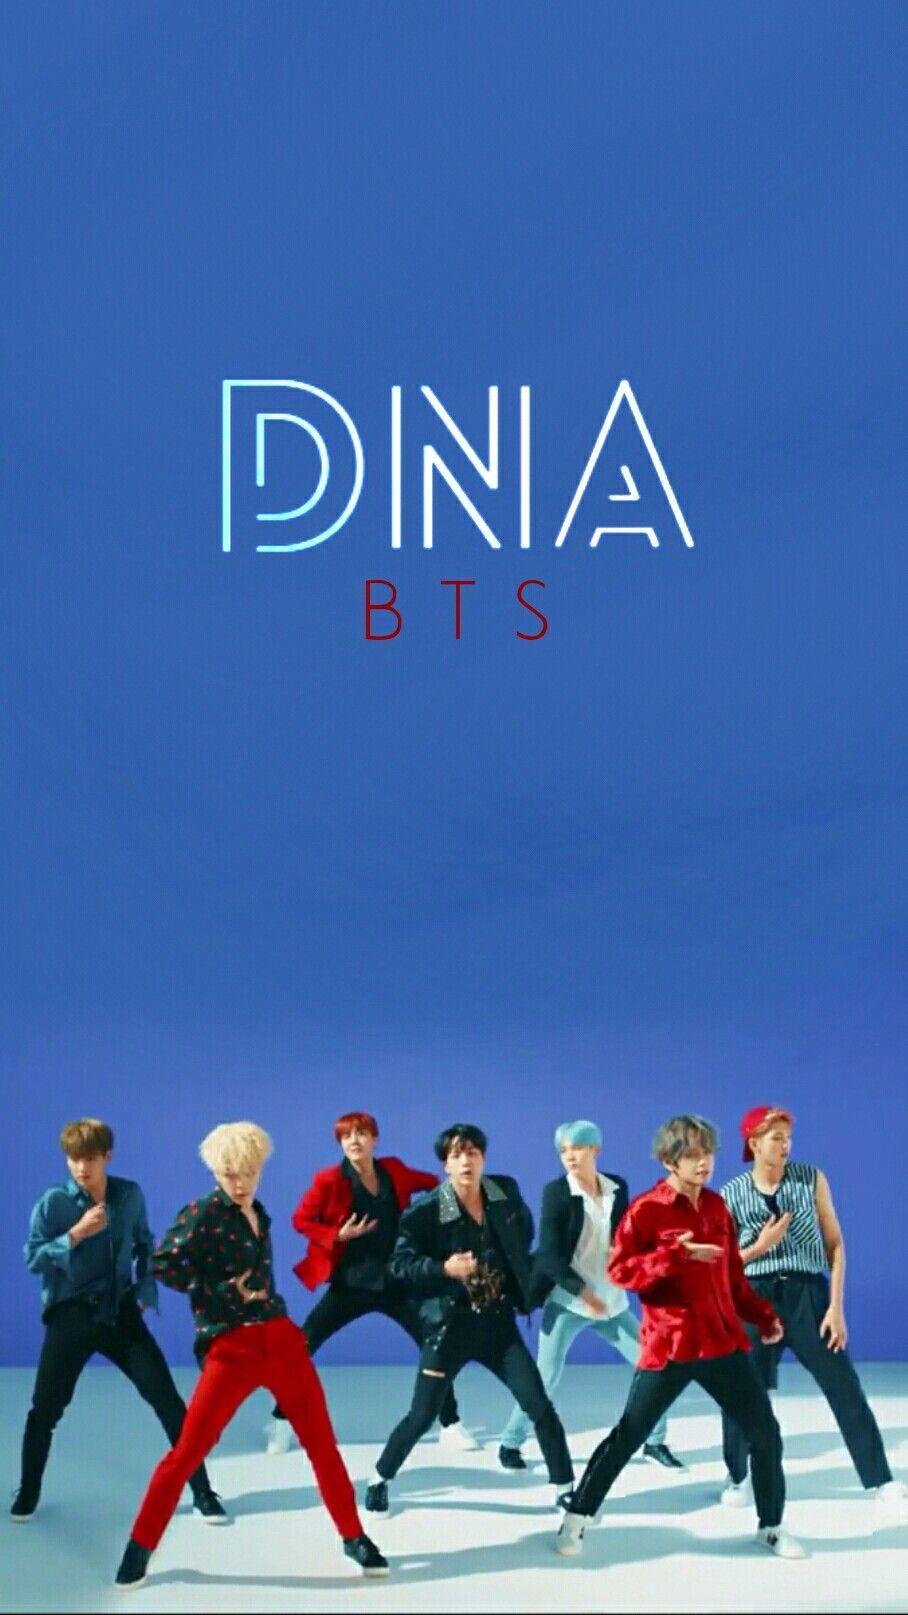 BTS DNA WALLPAPER #BTS #DNA #Wallpaper Wallpaper | My Wallpapers …